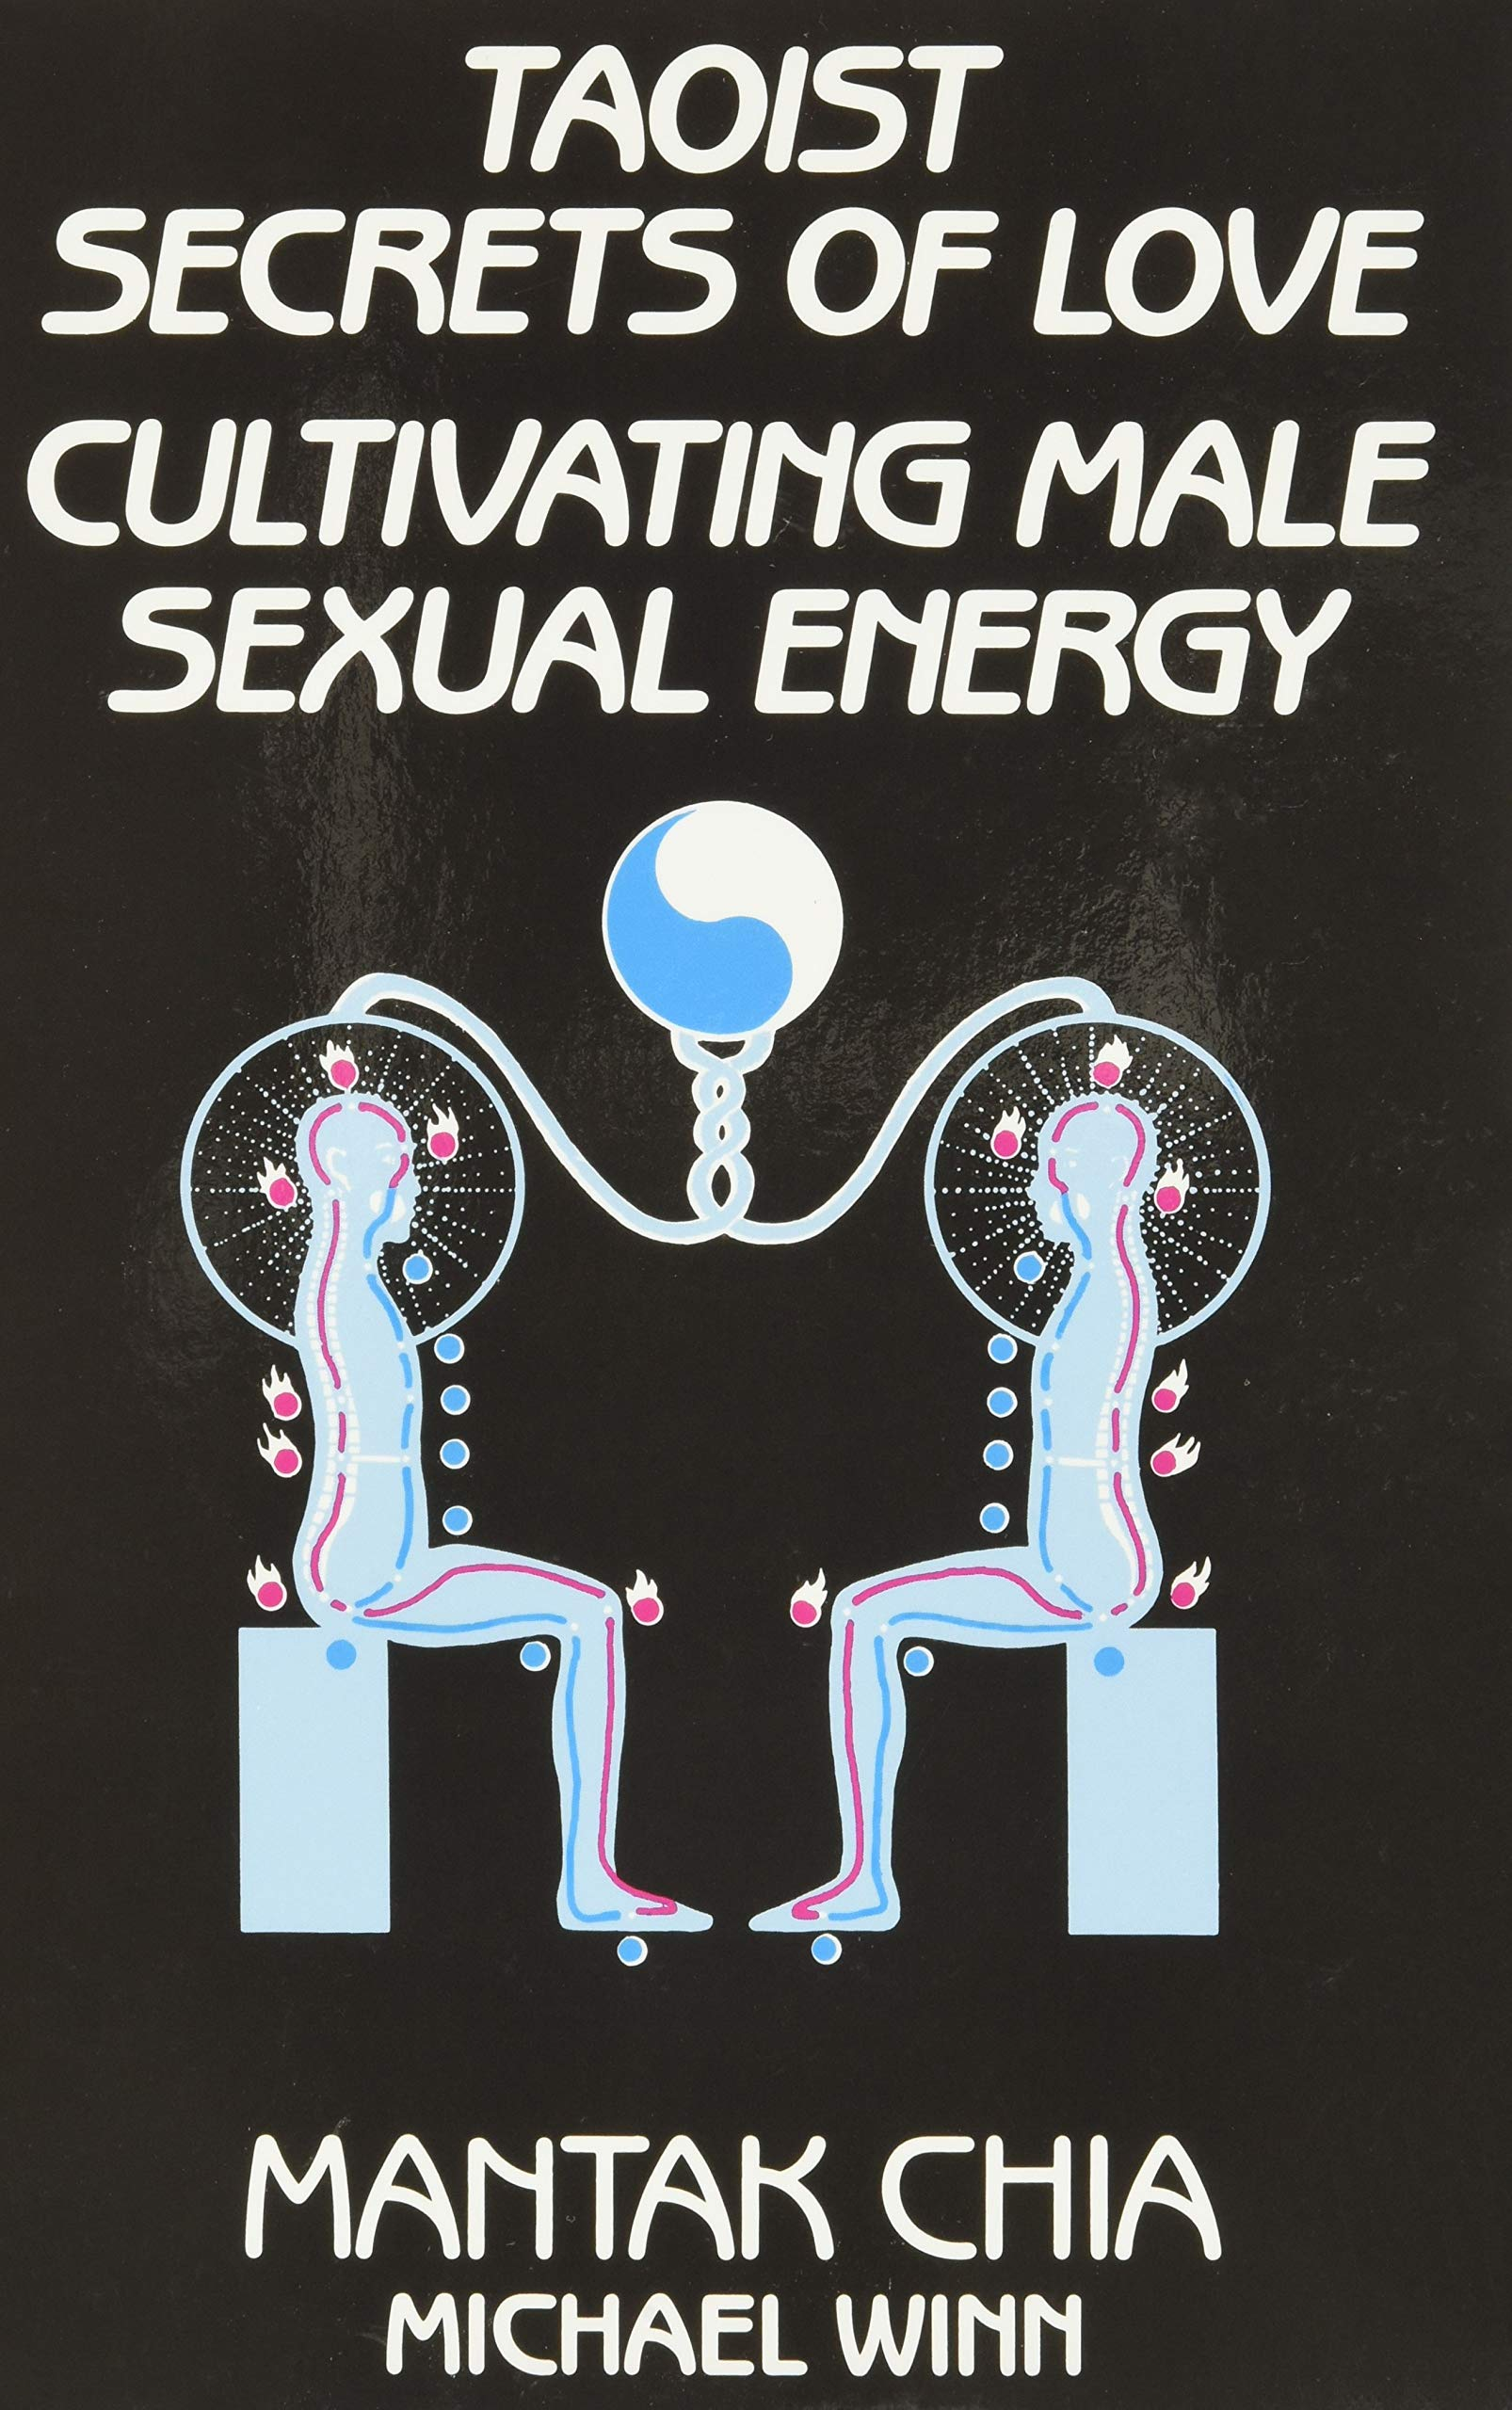 Chia M Taoist Secrets Of Love Cultivating Male Sexual Energy Chia Mantak Amazon De Bucher